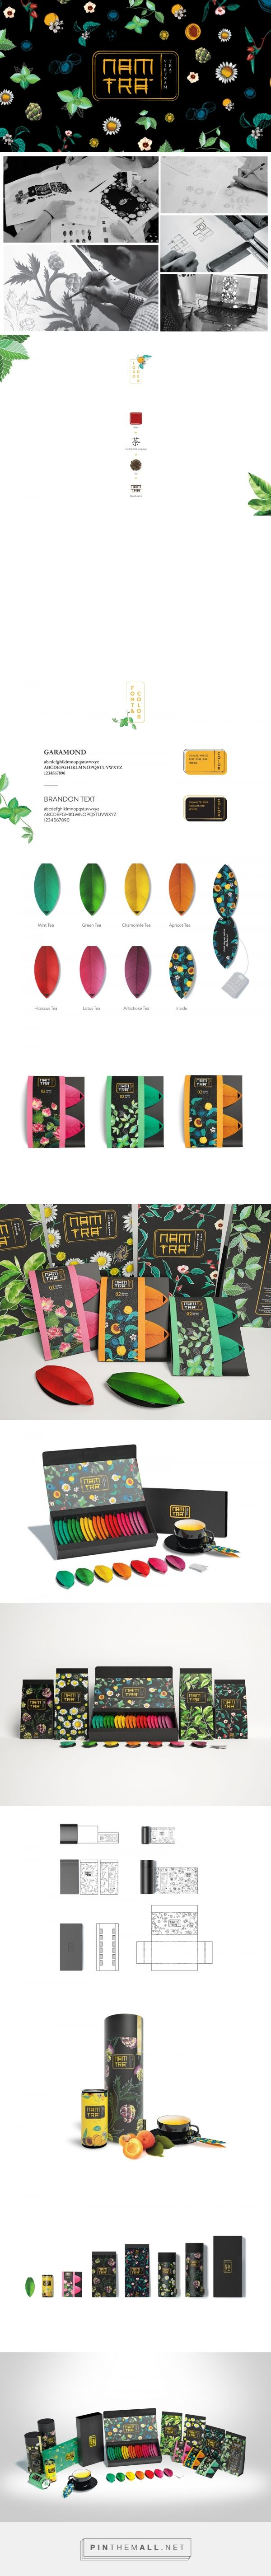 Nam Tra Tea packaging design by RIO Creative - http://www.packagingoftheworld.com/2016/12/nam-tra.html